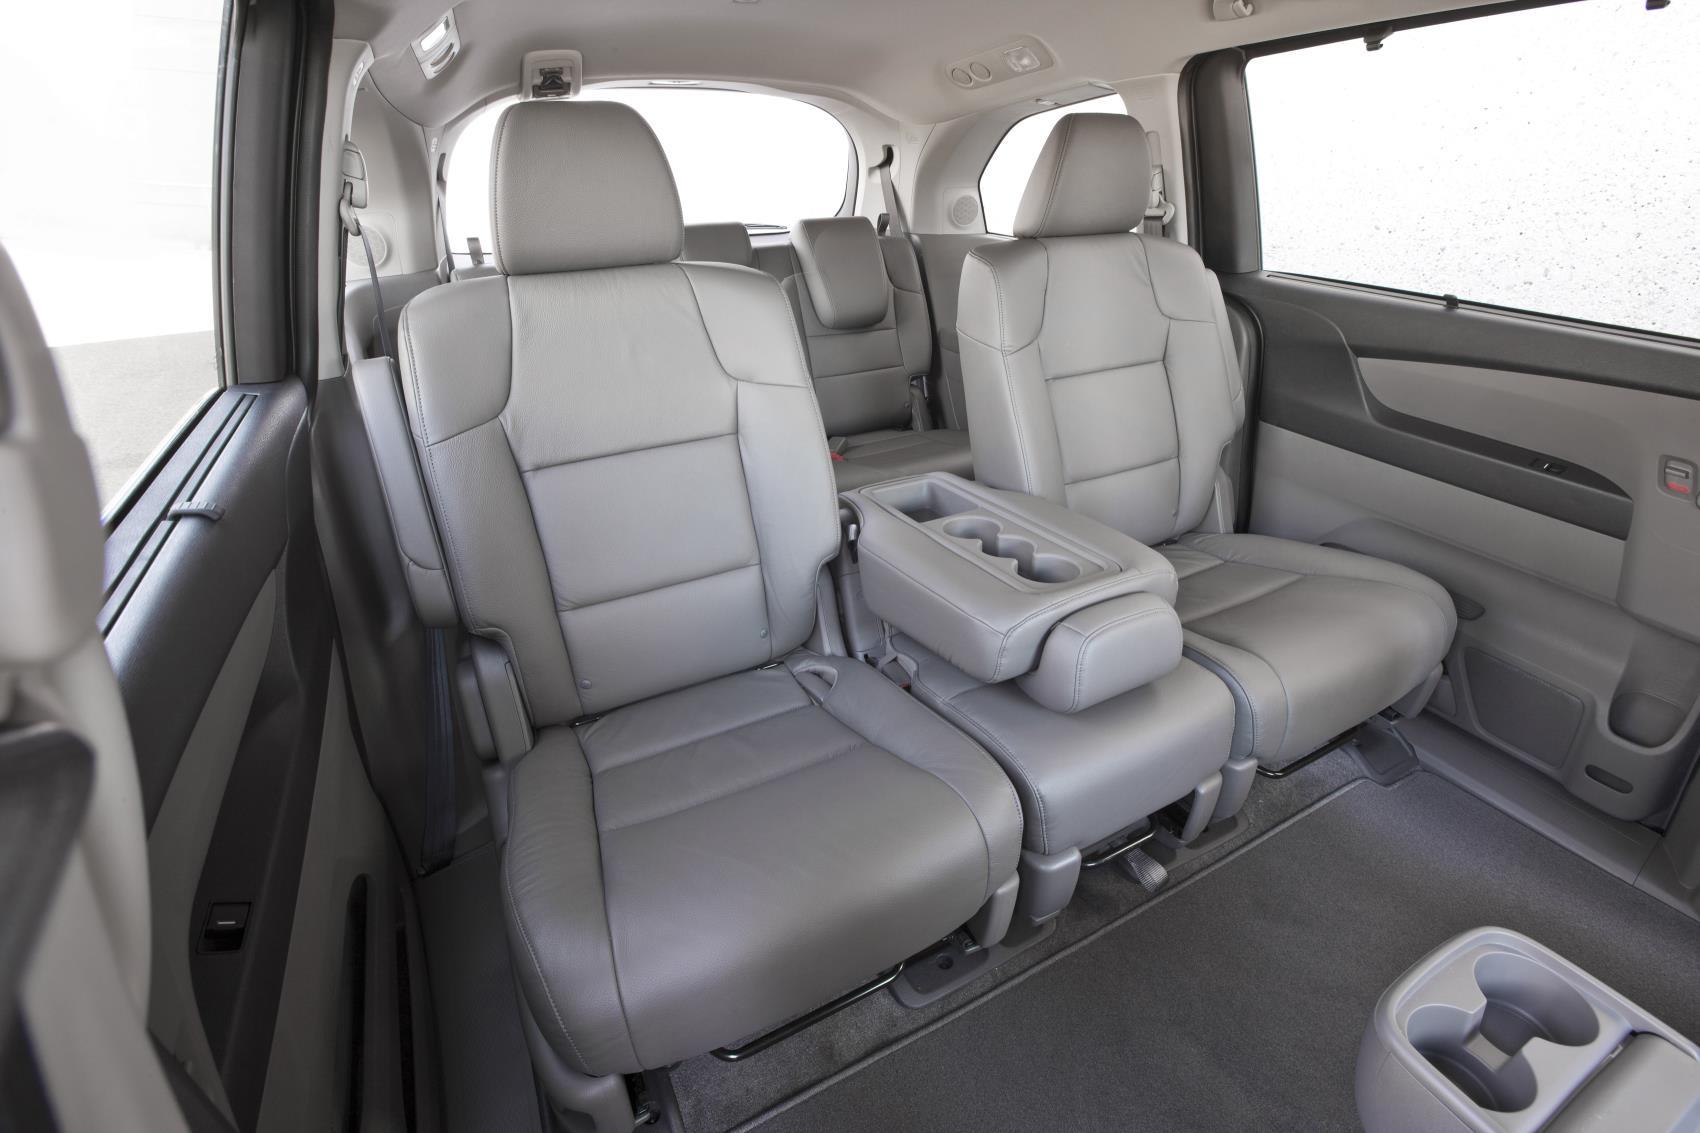 Recall Alert: 2011-2016 Honda Odyssey